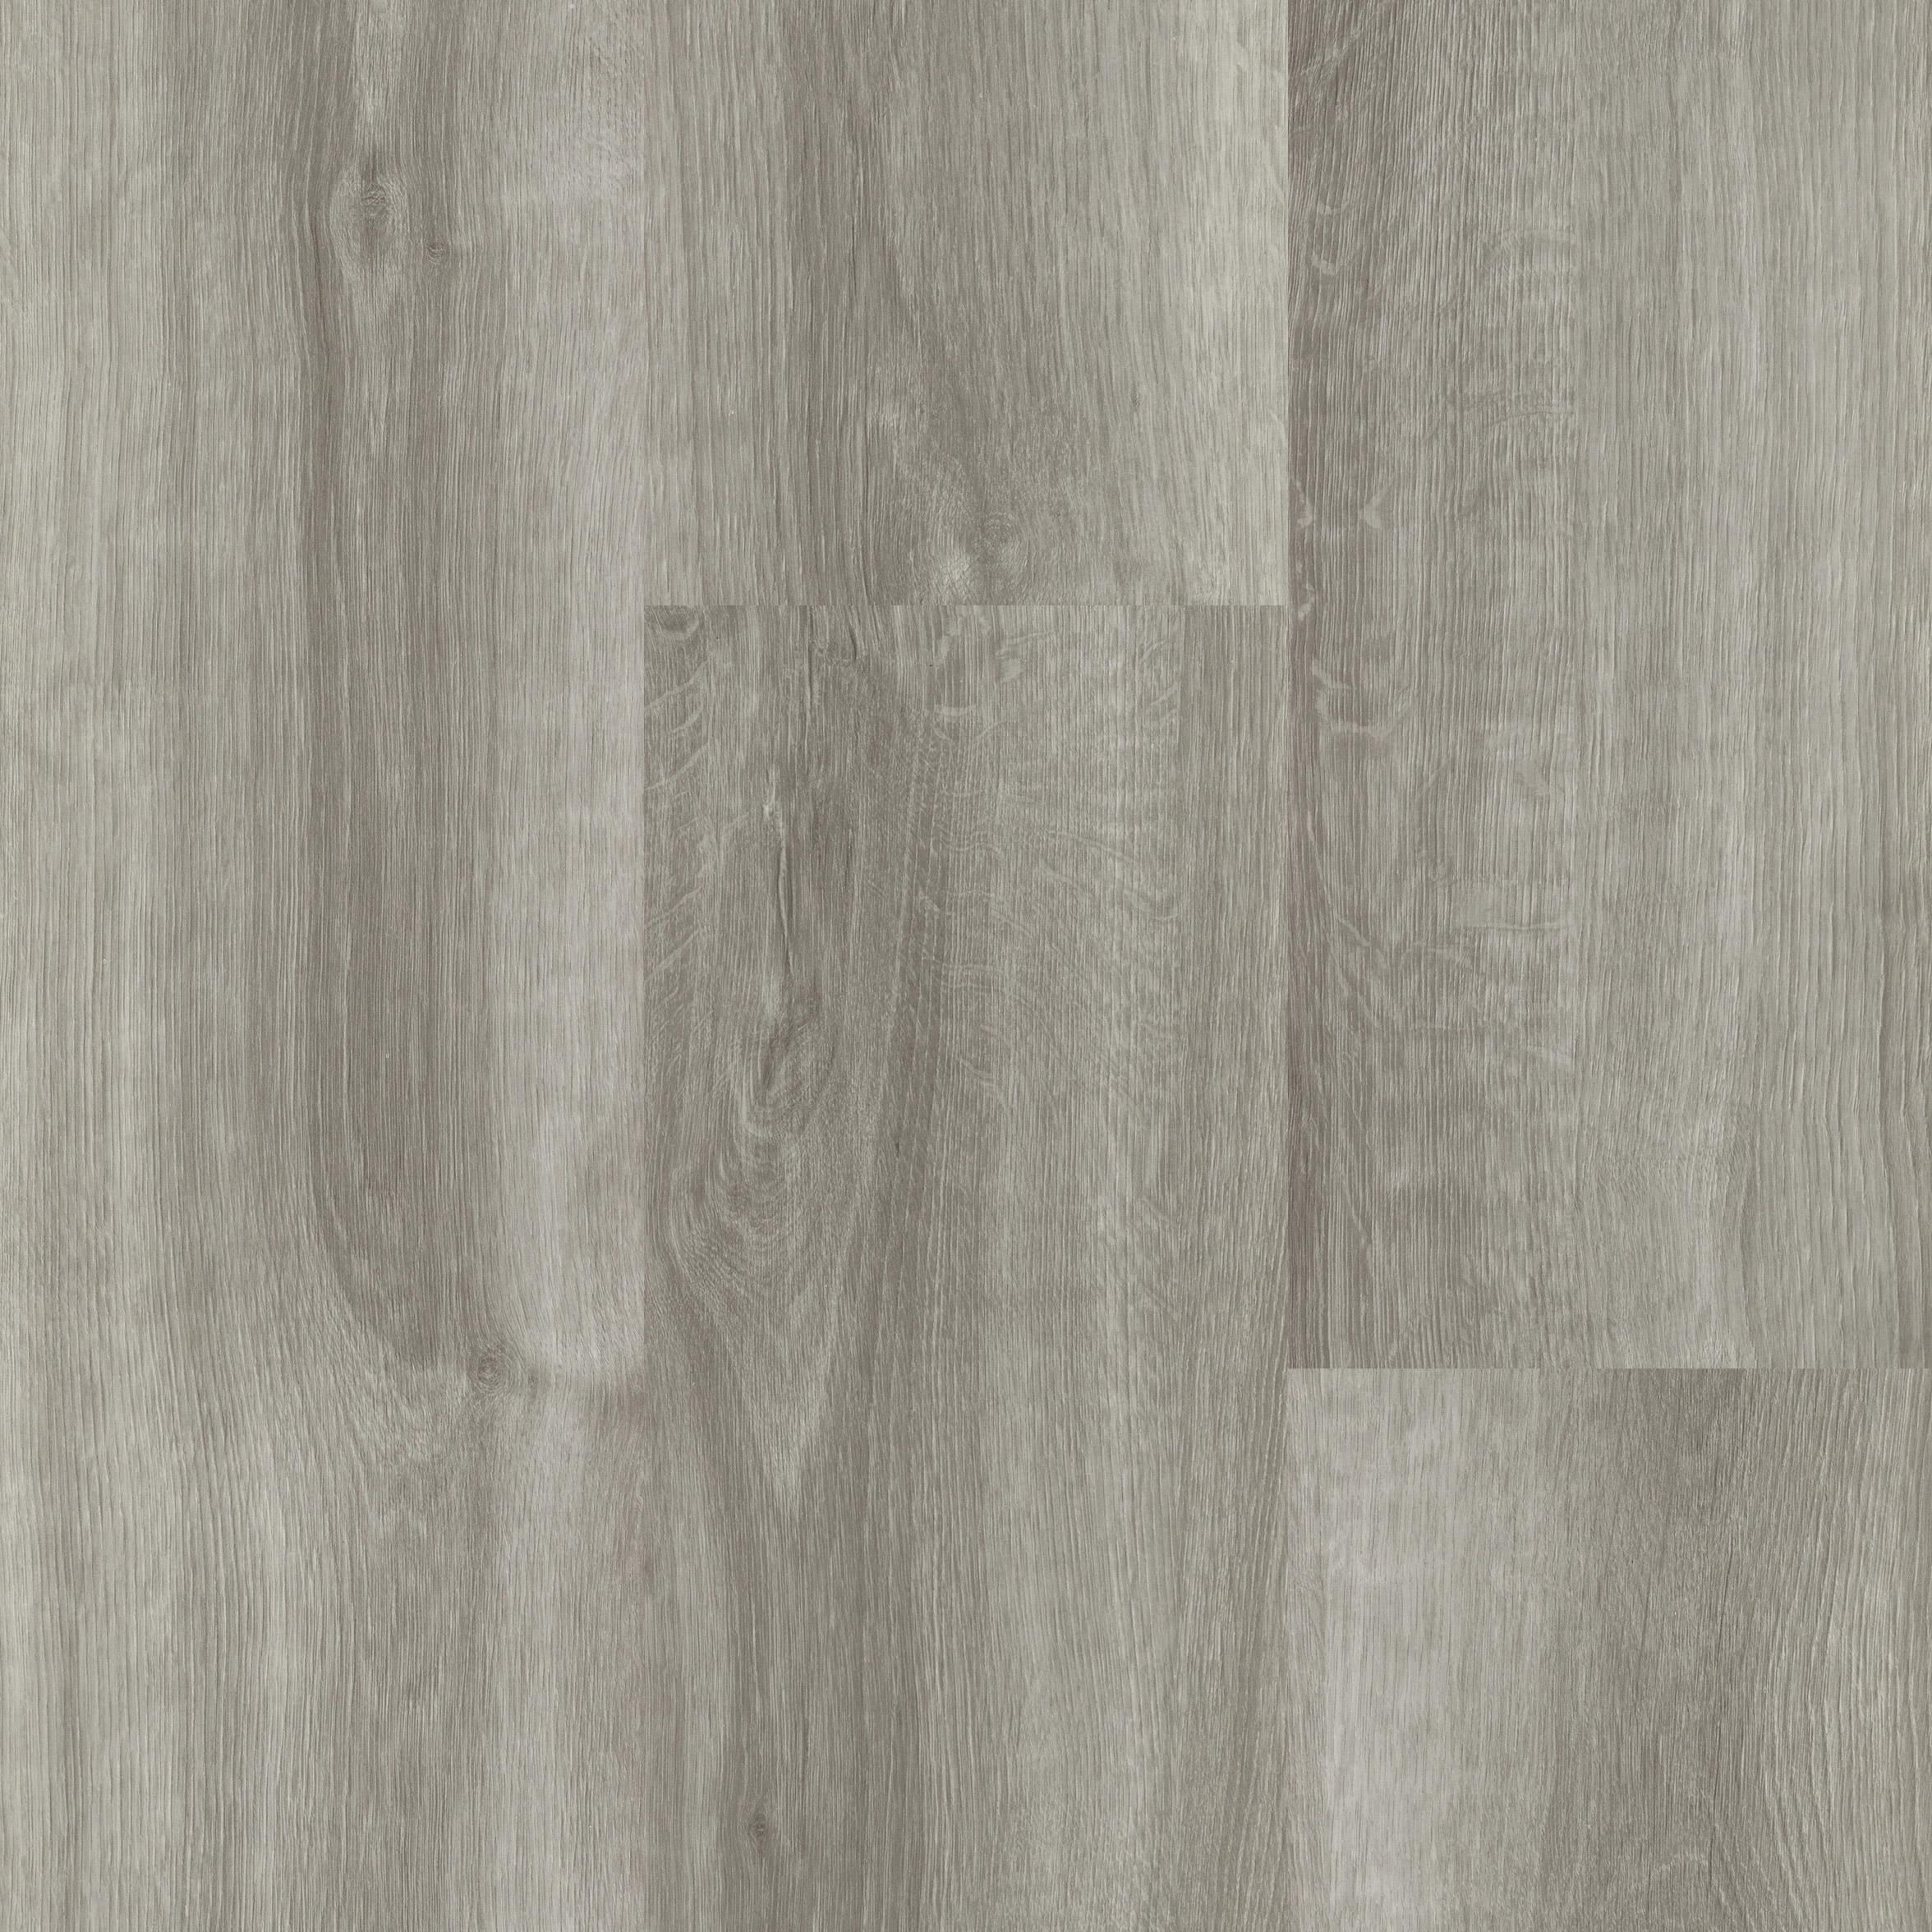 Luxury Vinyl Plank Mat Spring Oak 8 Wide Click Together Luxury Vinyl Plank Luxury Vinyl Plank Vinyl Plank Vinyl Flooring